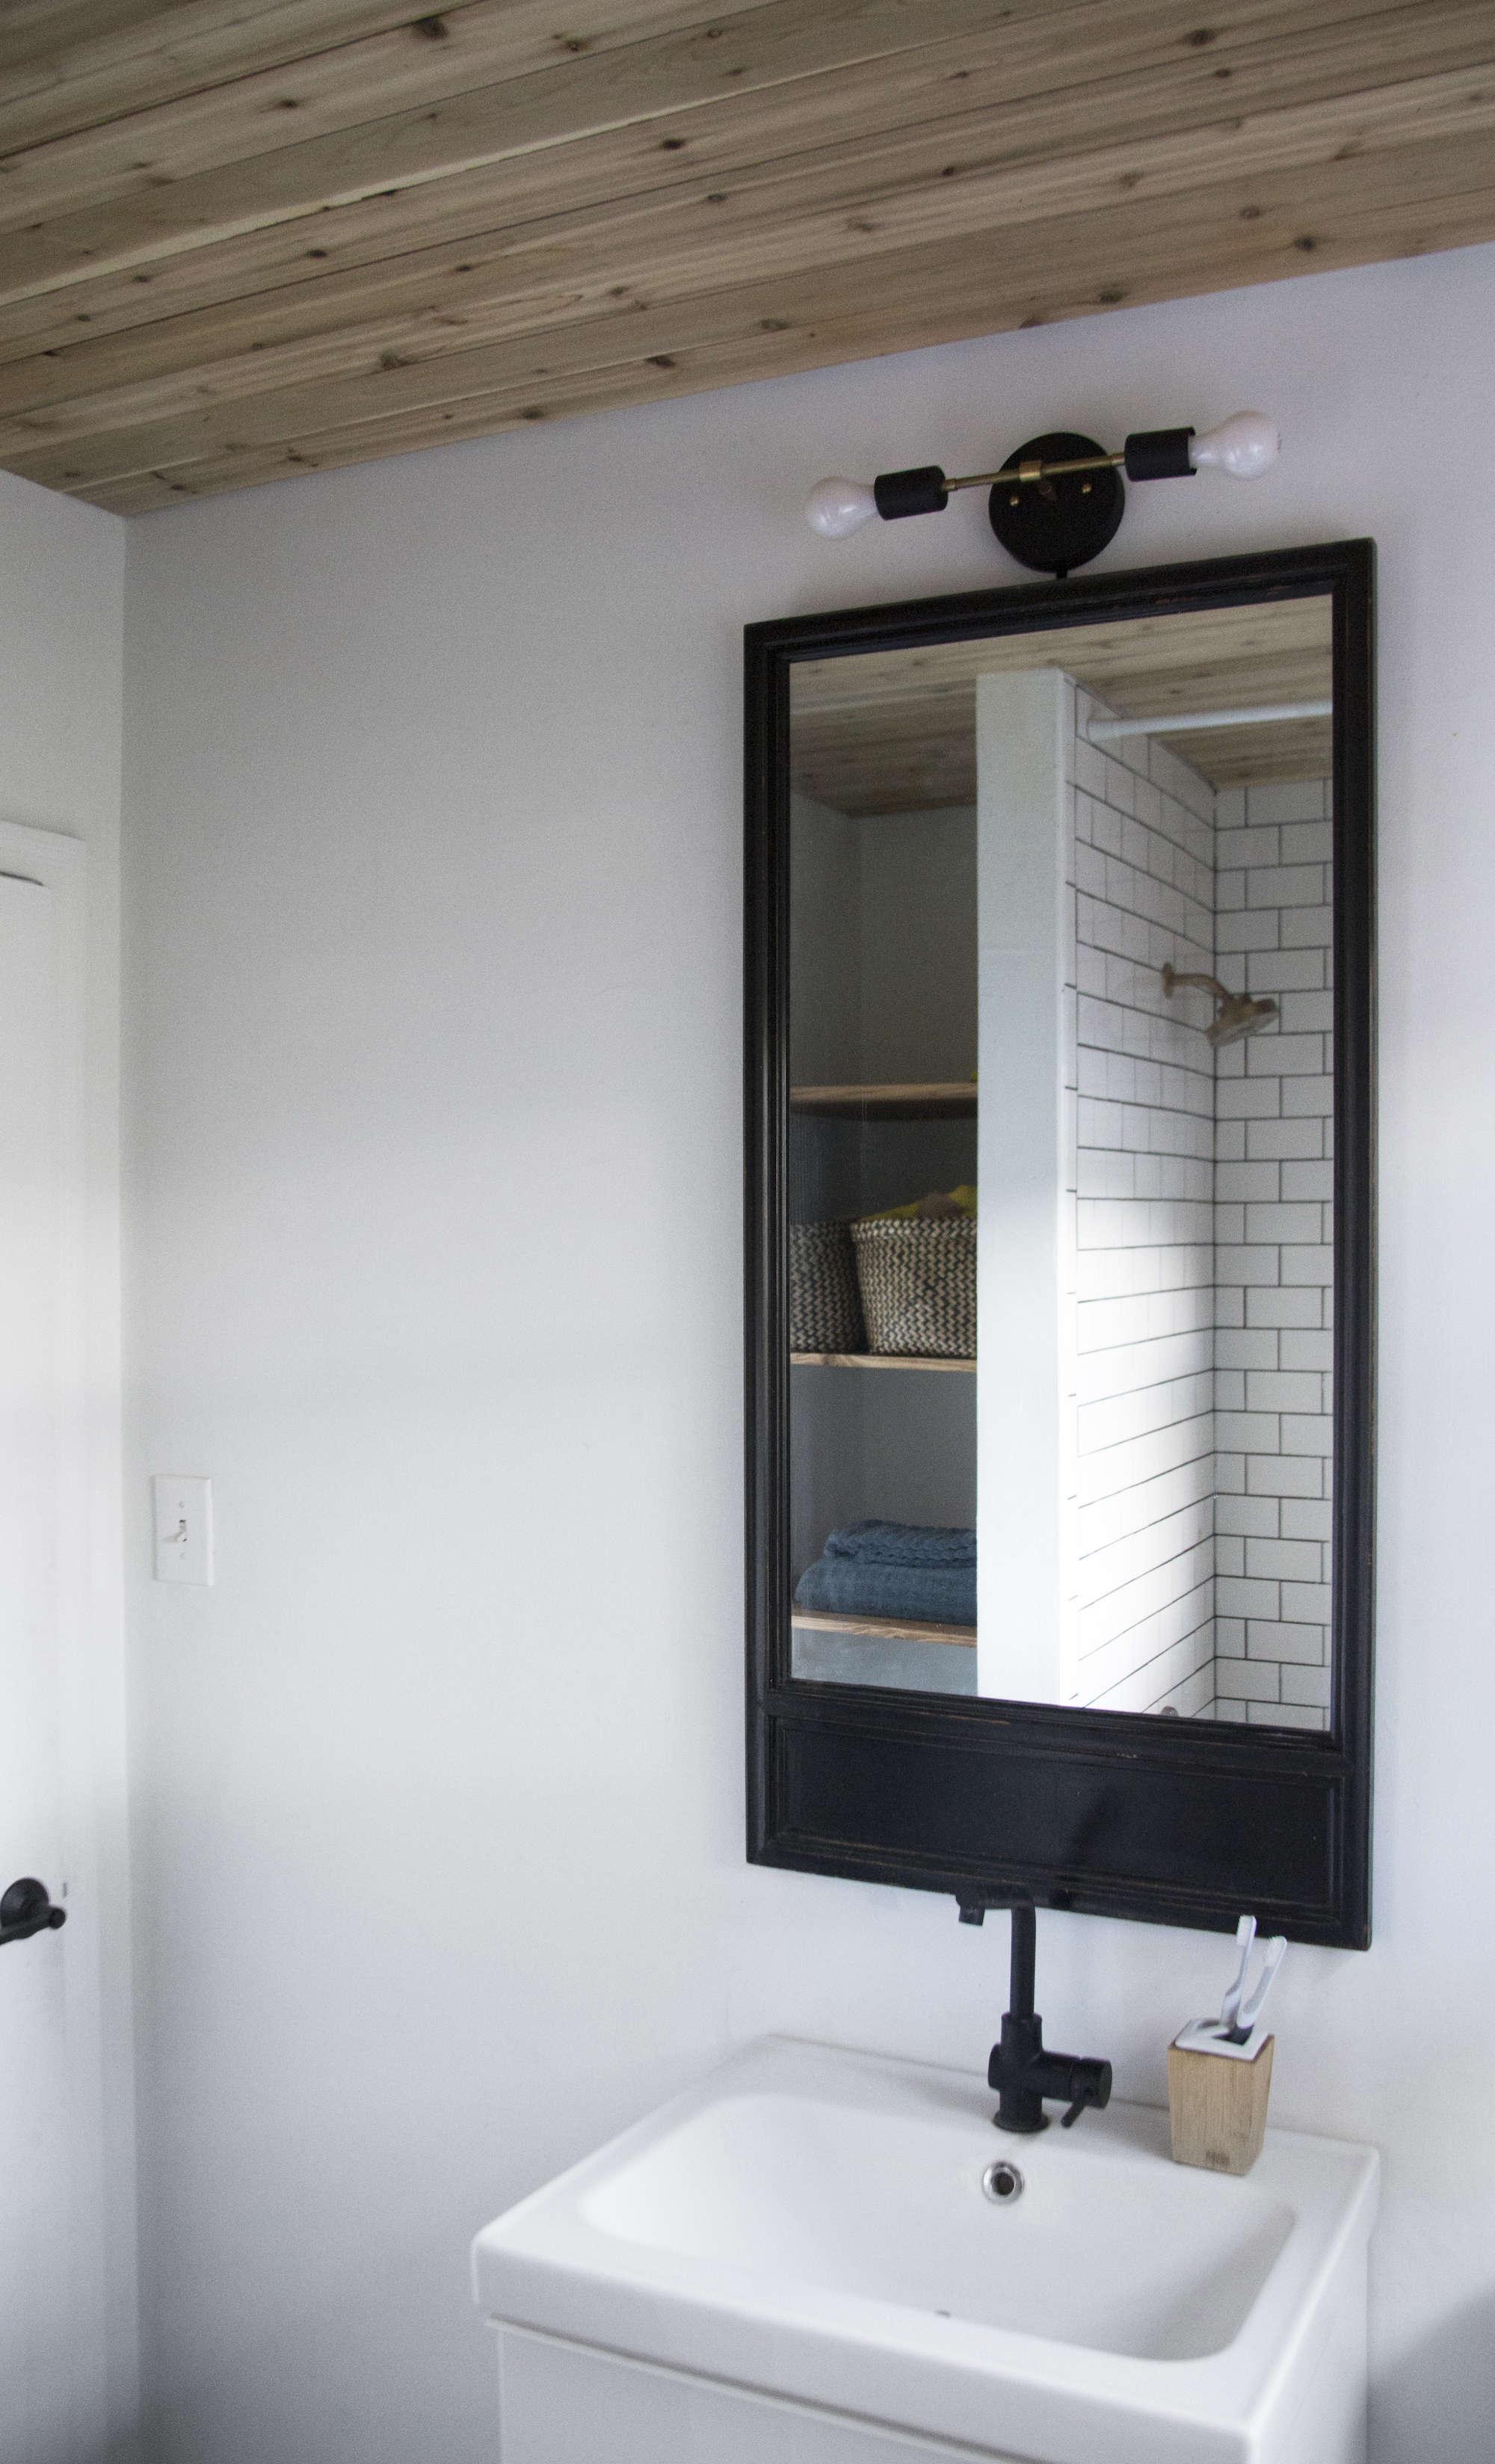 bathroom-budget-remodel-wood-ceiling-black-mirror